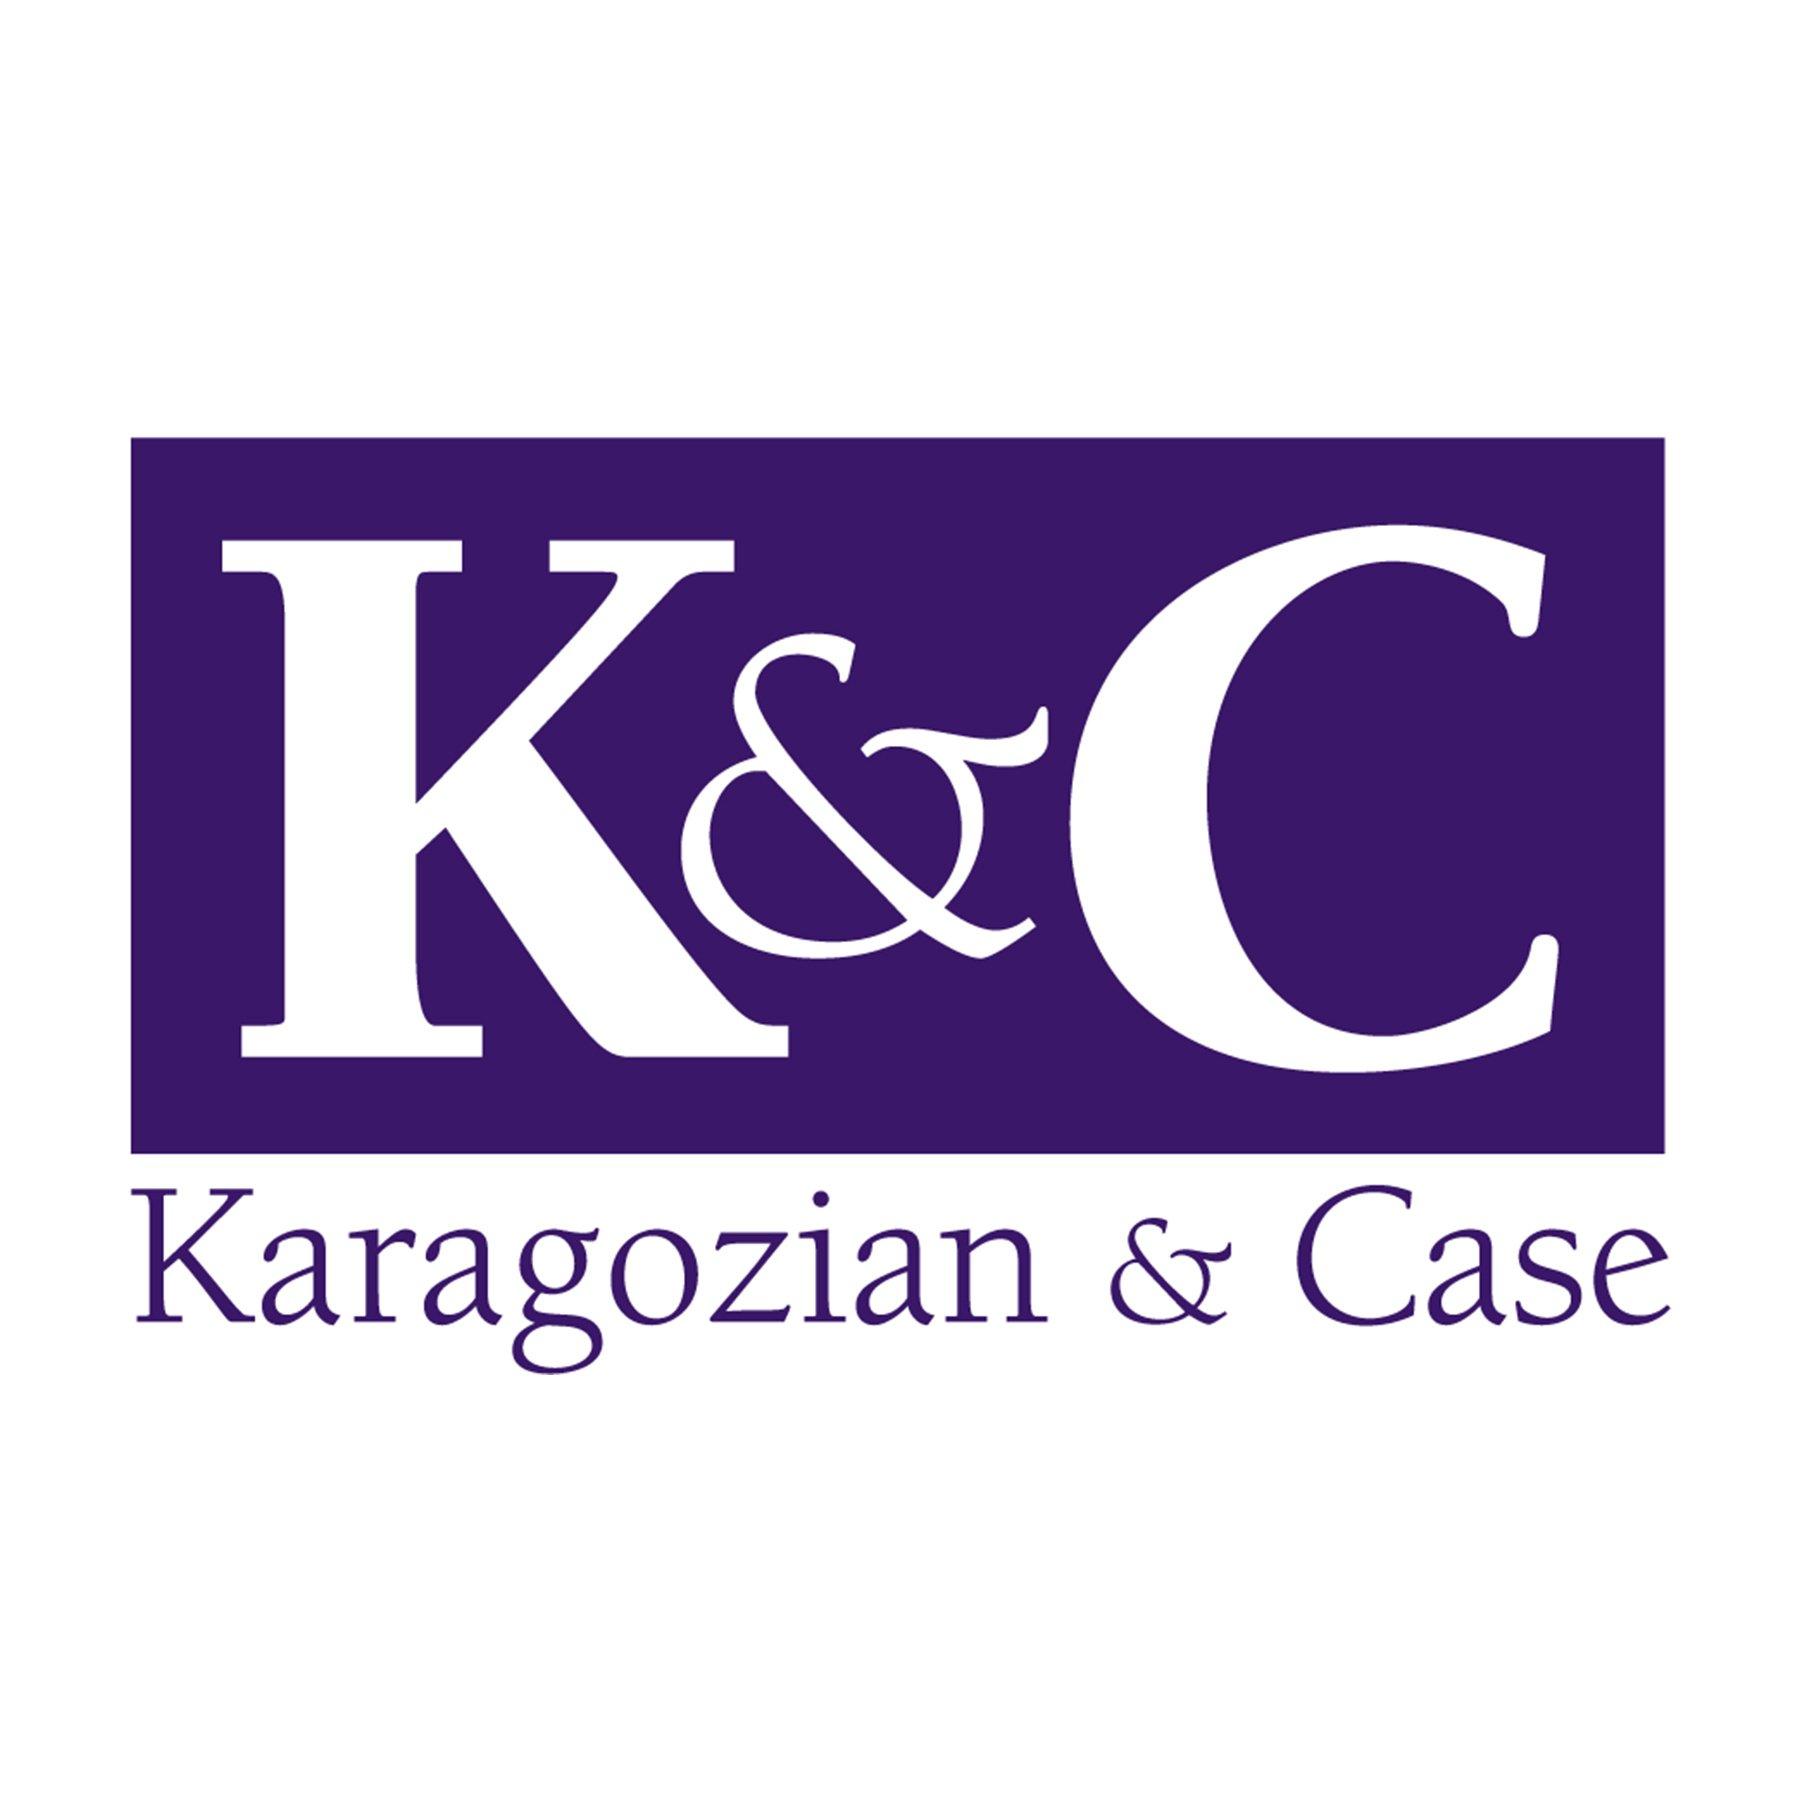 Karagozian & Case Engineering Company Logo